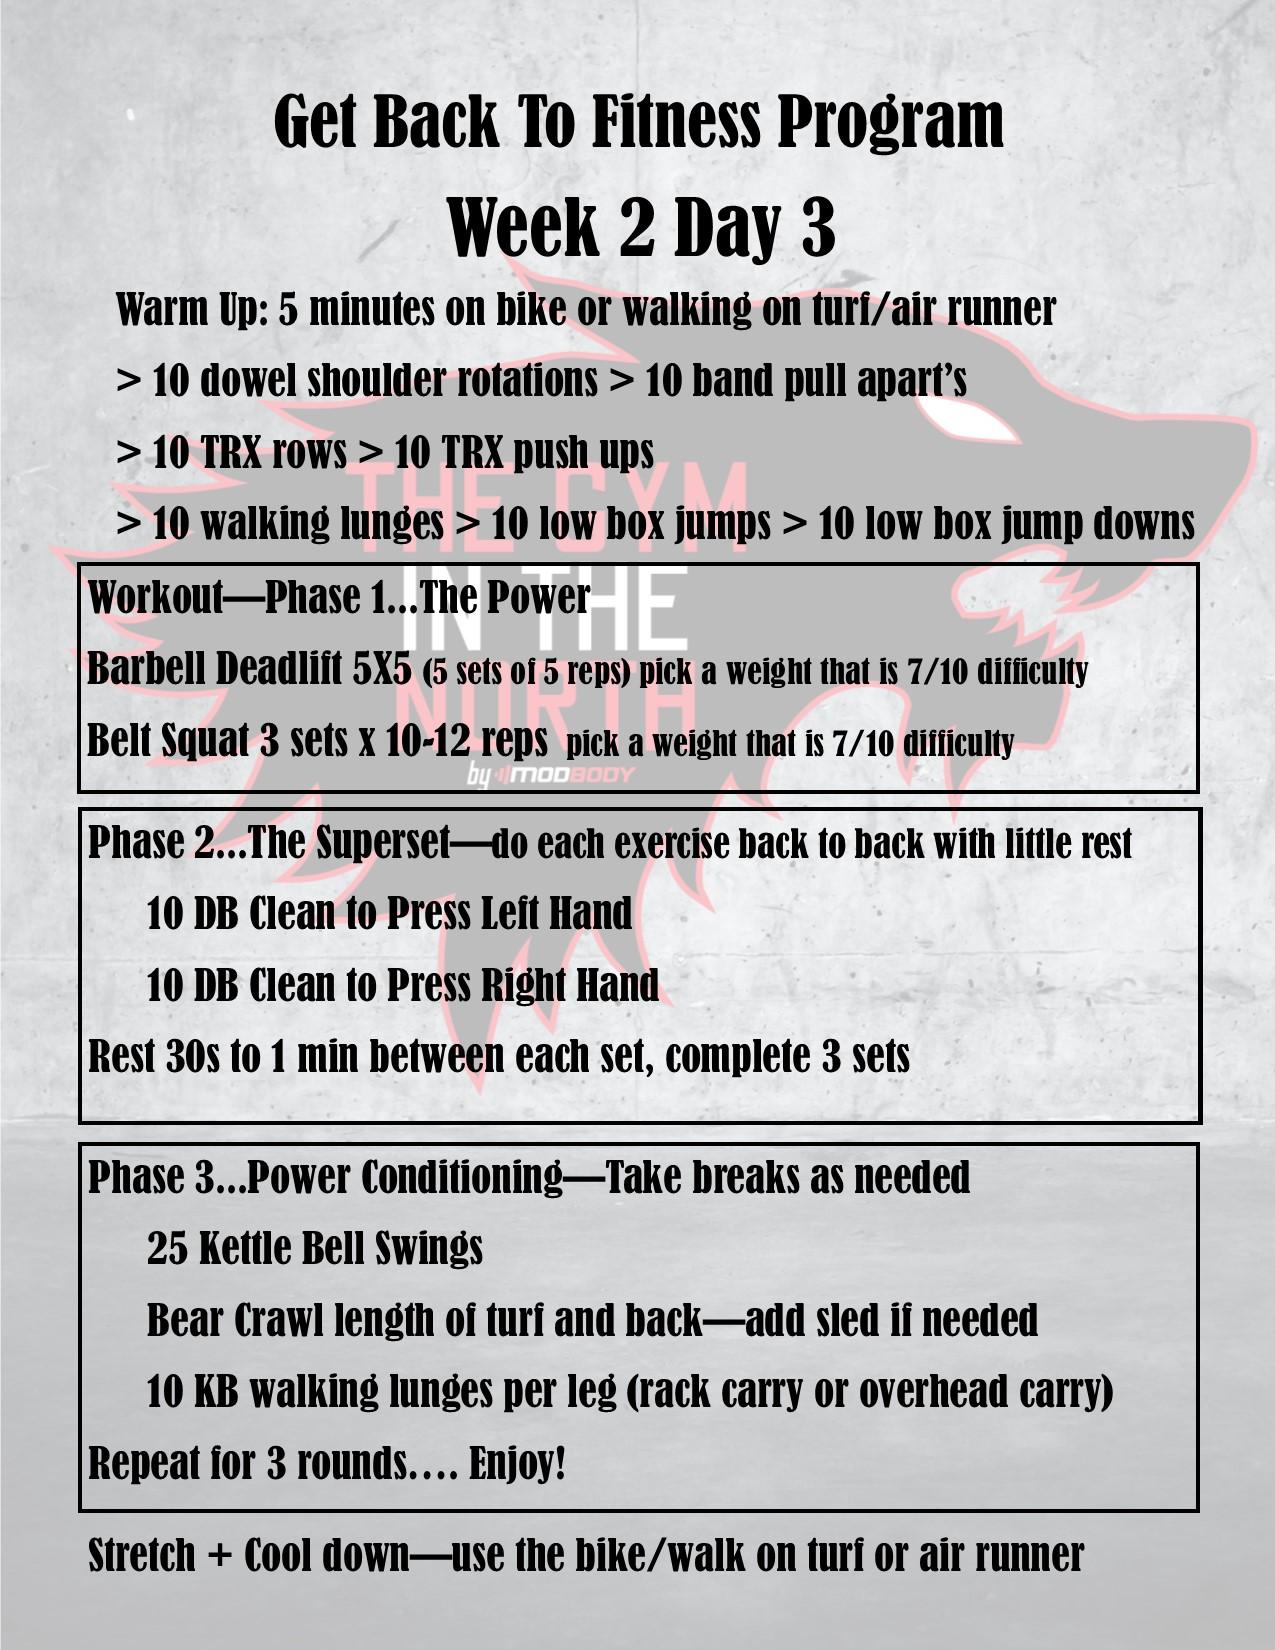 week-2-day-3-deadlift.jpg